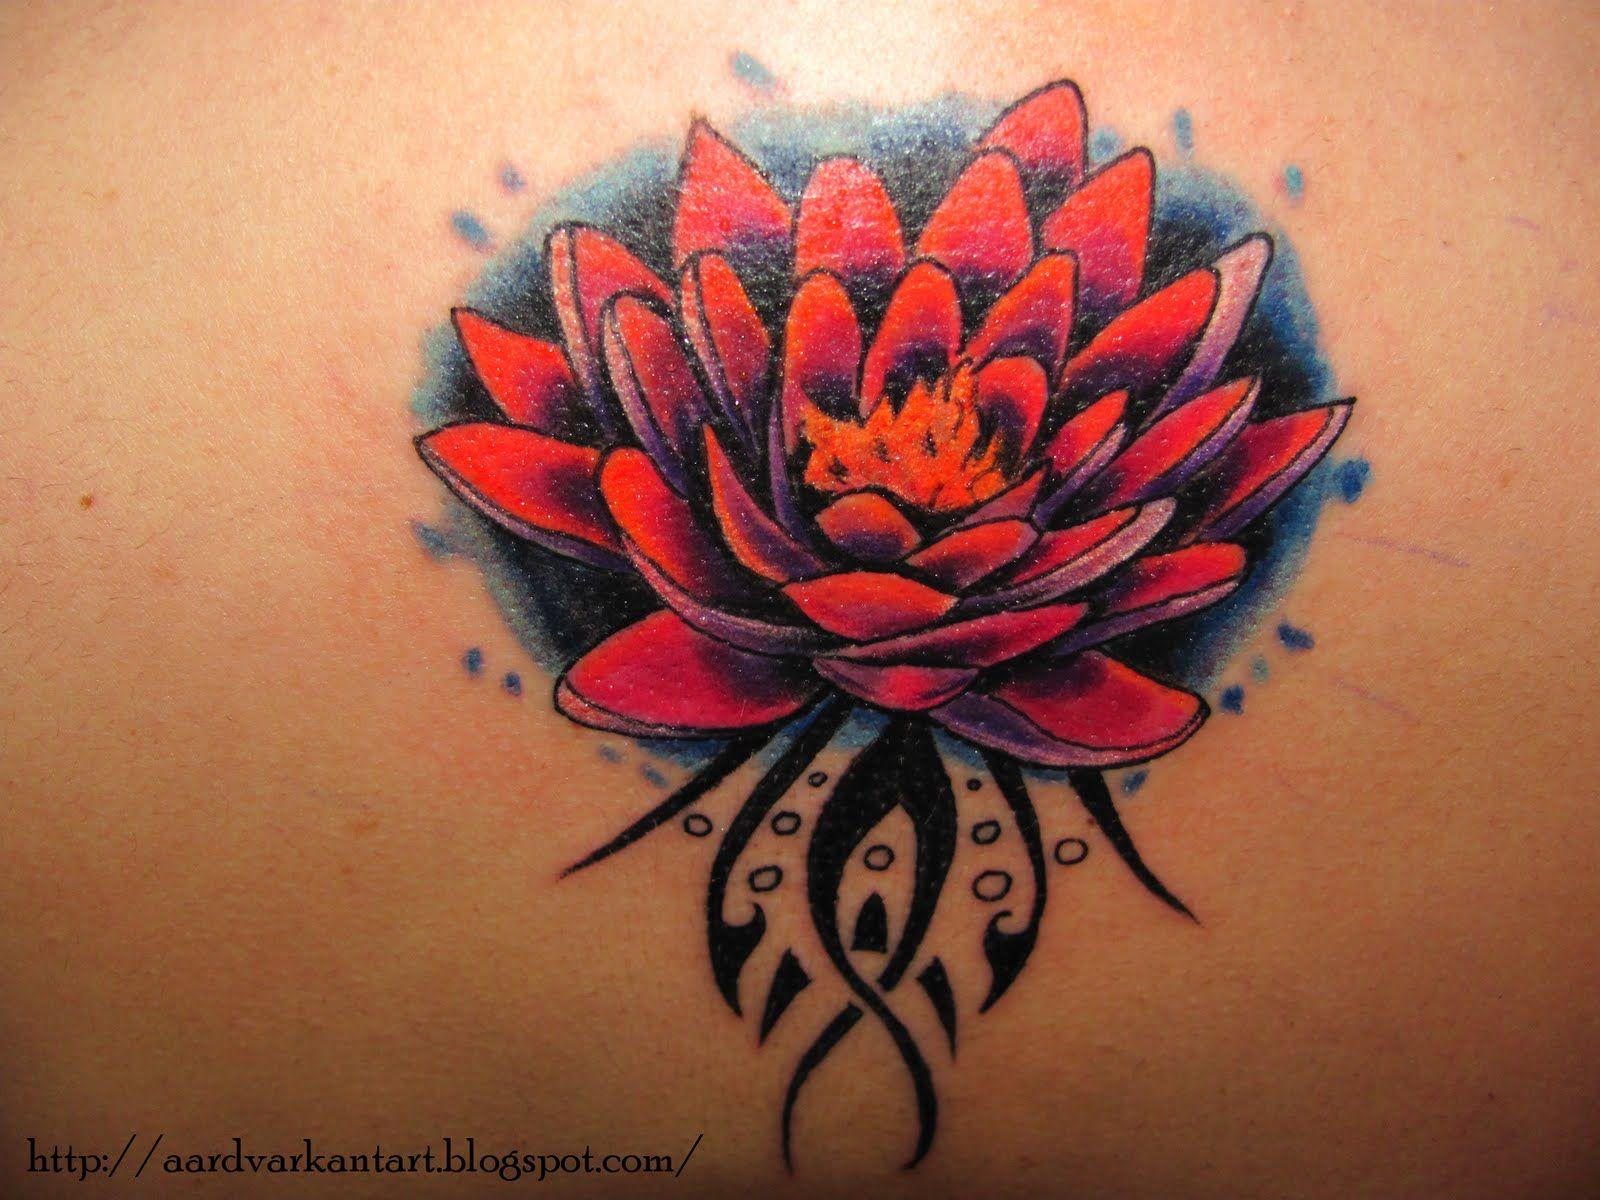 tattoos | Tribal Red Lotus Flower Tattoos Designs | Tattoos ...